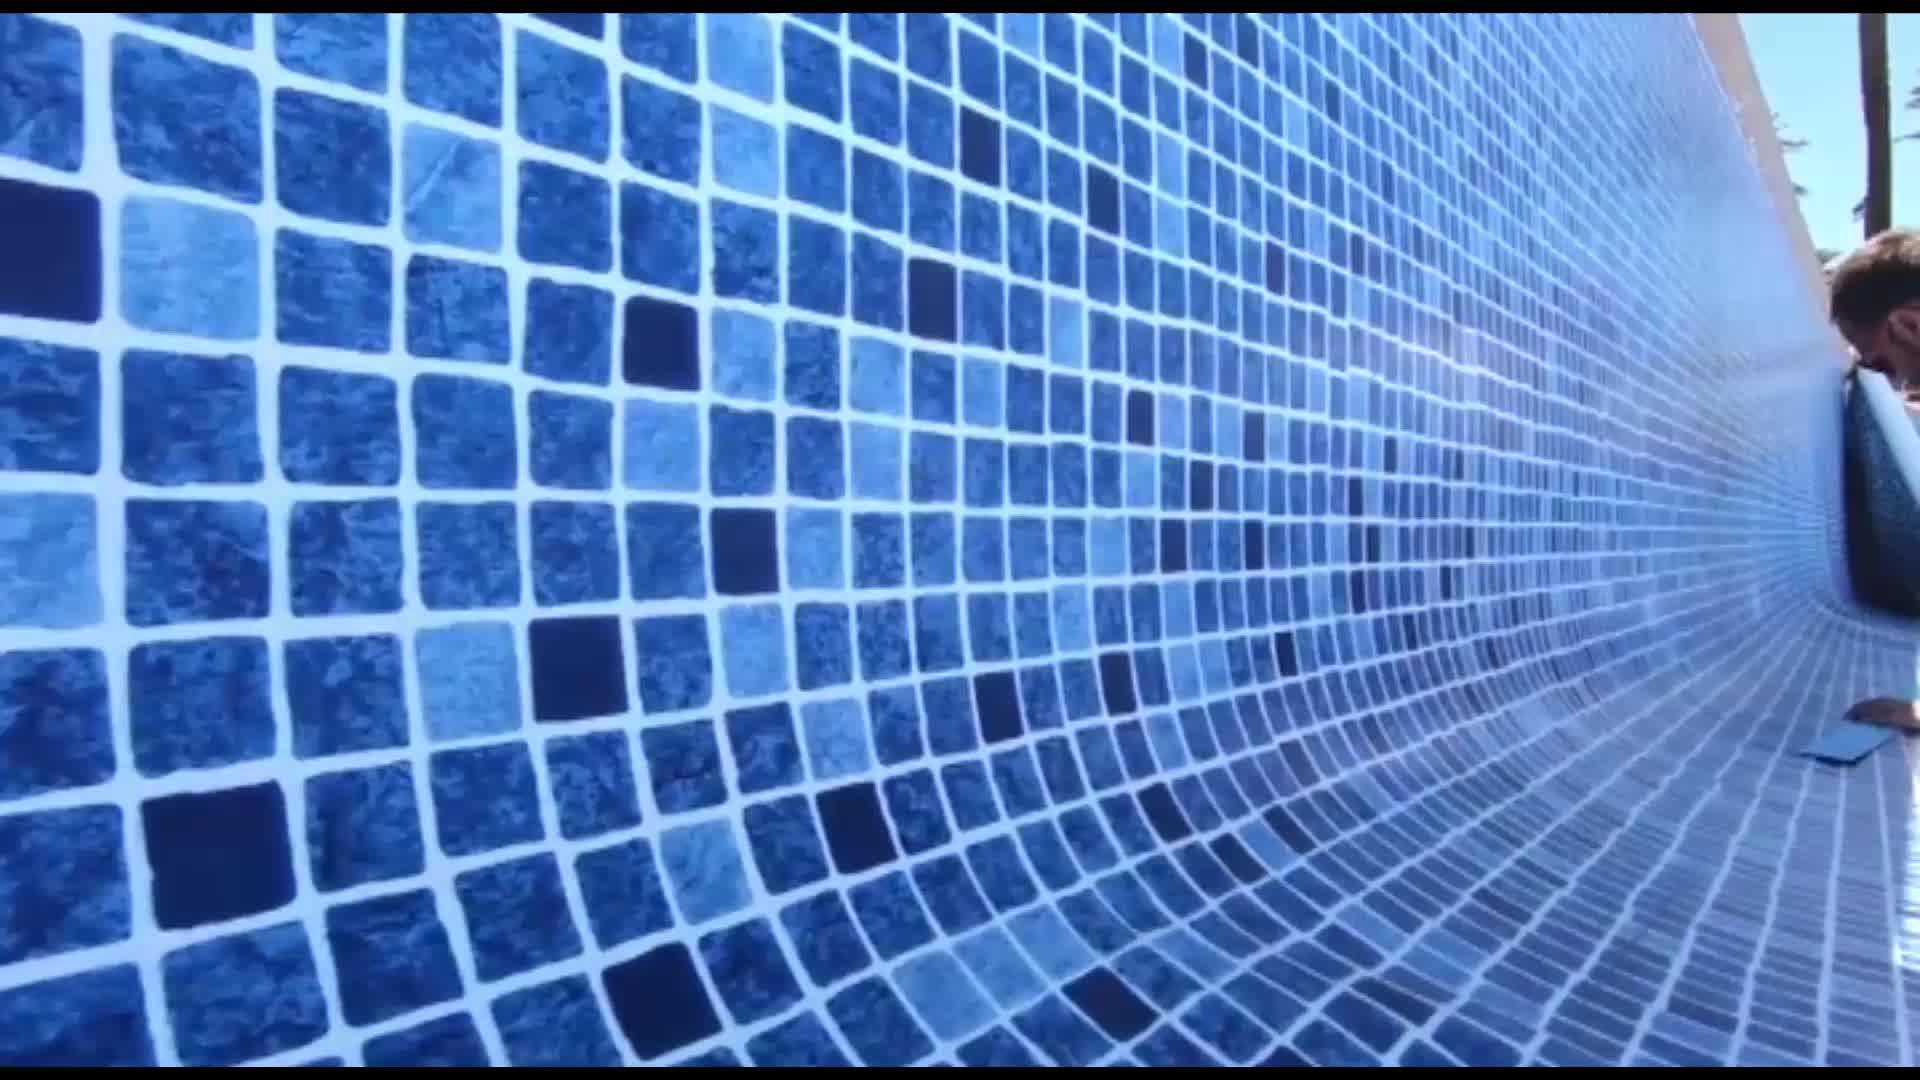 Pvc levha vinil yüzme havuzu kaplaması malzeme para piscinas 0.4mm 0.5mm 1.5mm/vinil astarlar havuzlar için 60 mil çin fabrika